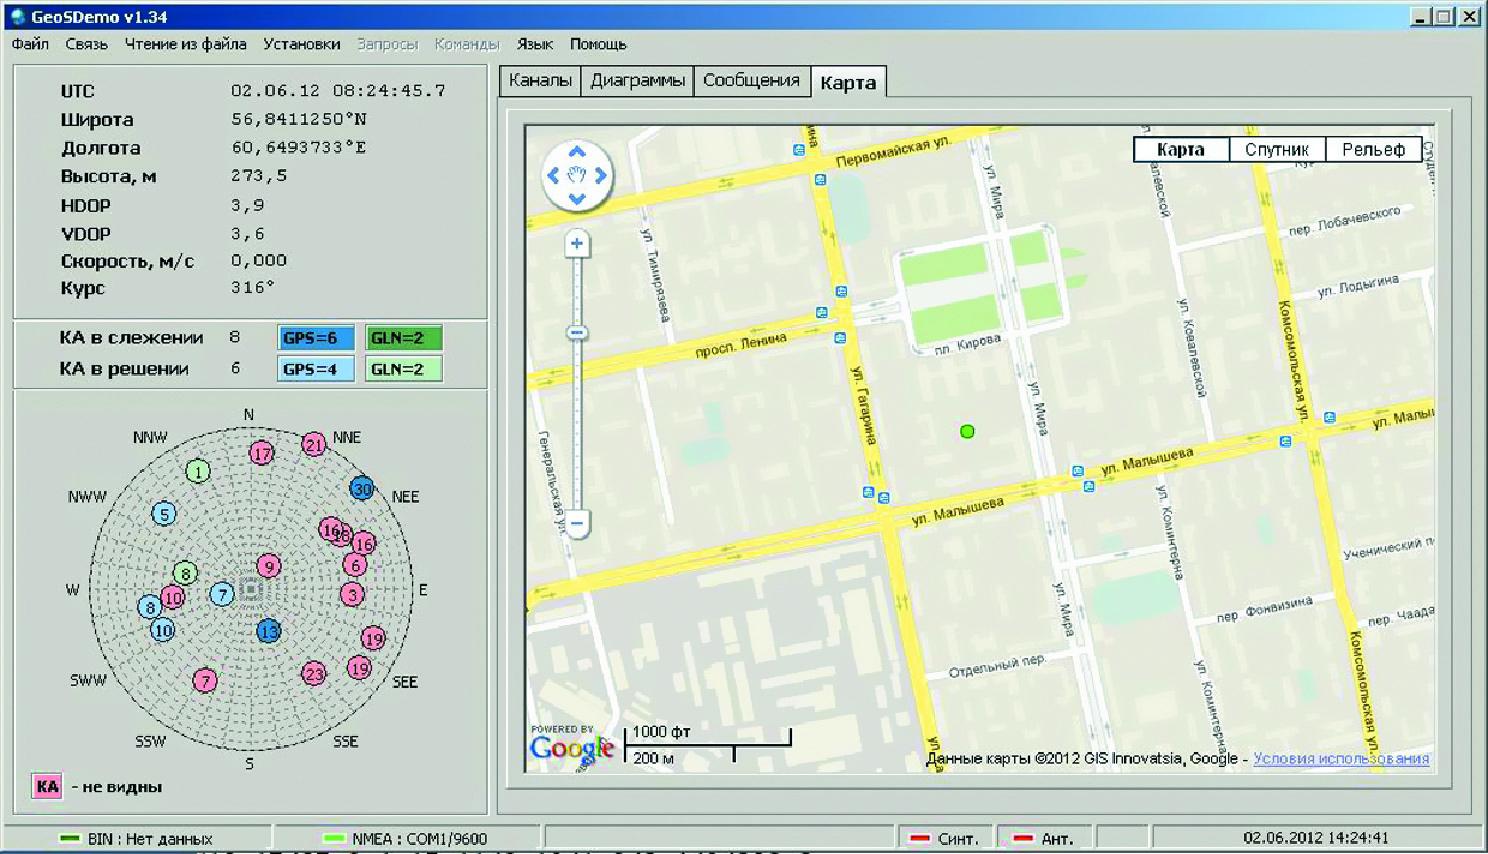 Окно программы GeoSDemo с указанием объекта на карте Google.